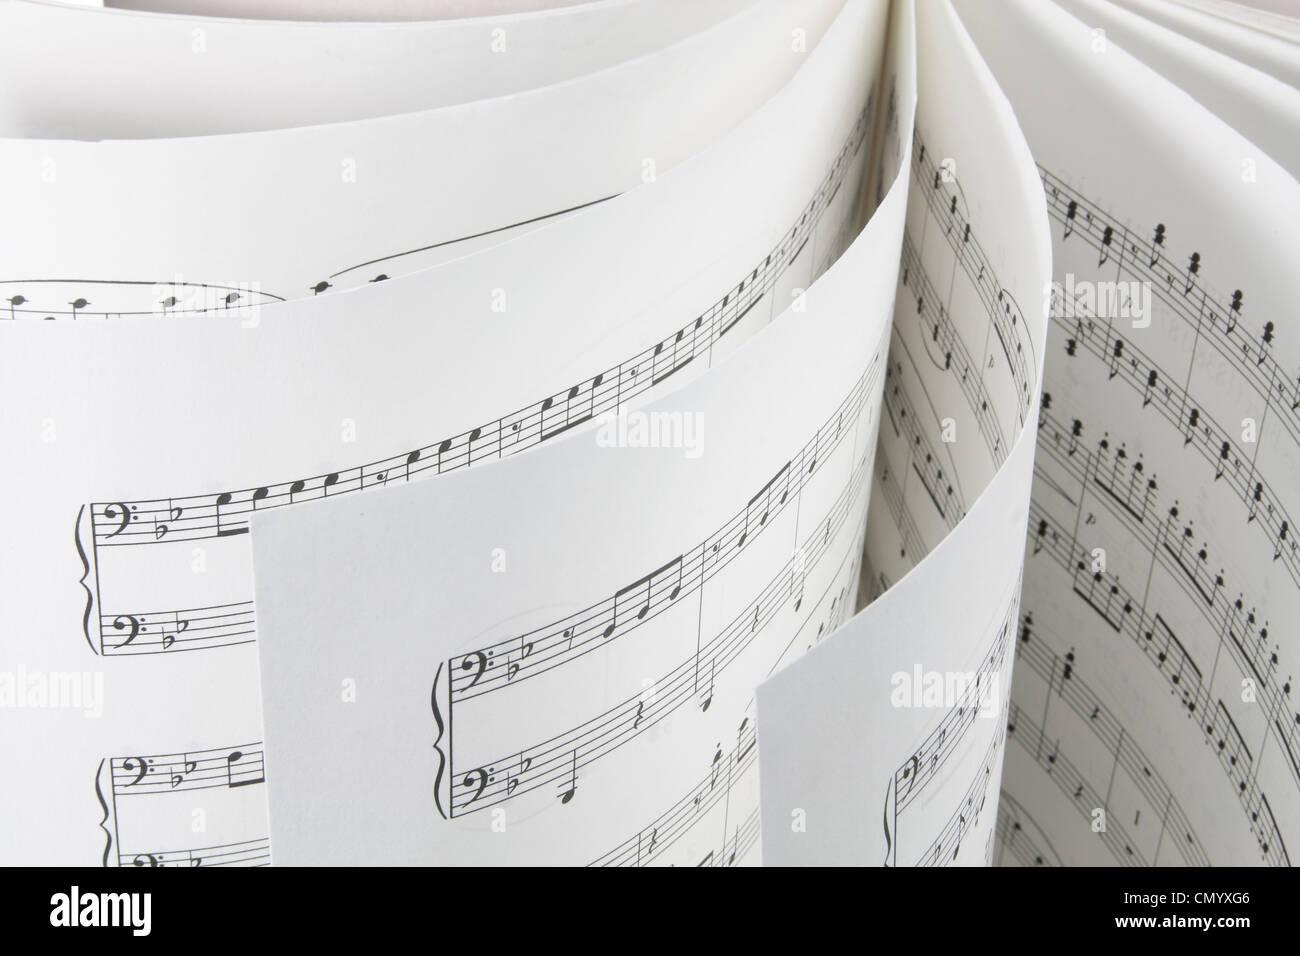 Music Score - Stock Image